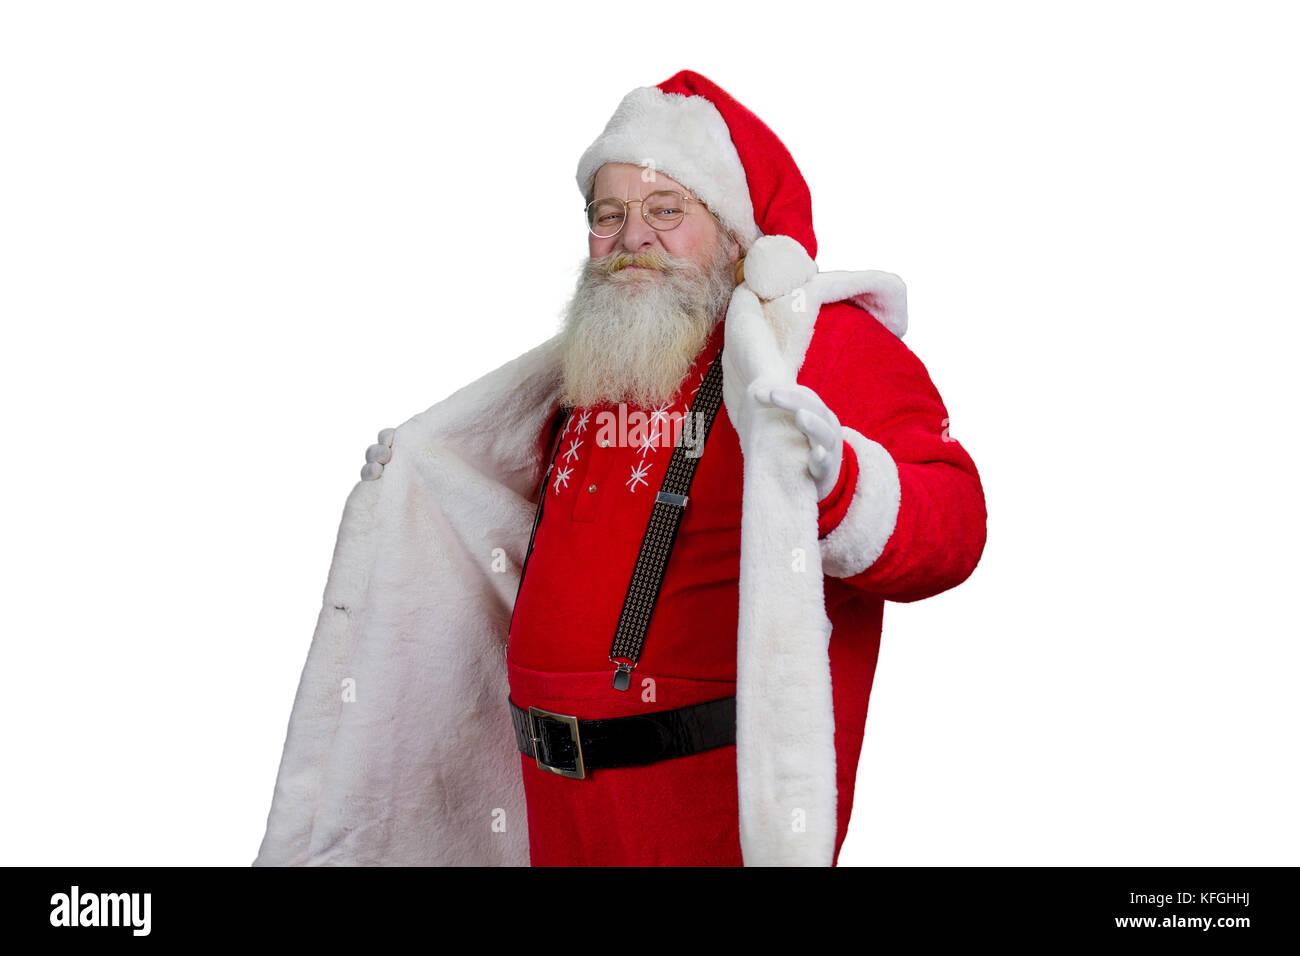 Santa Beard No Background Clipart Free Download Clipart